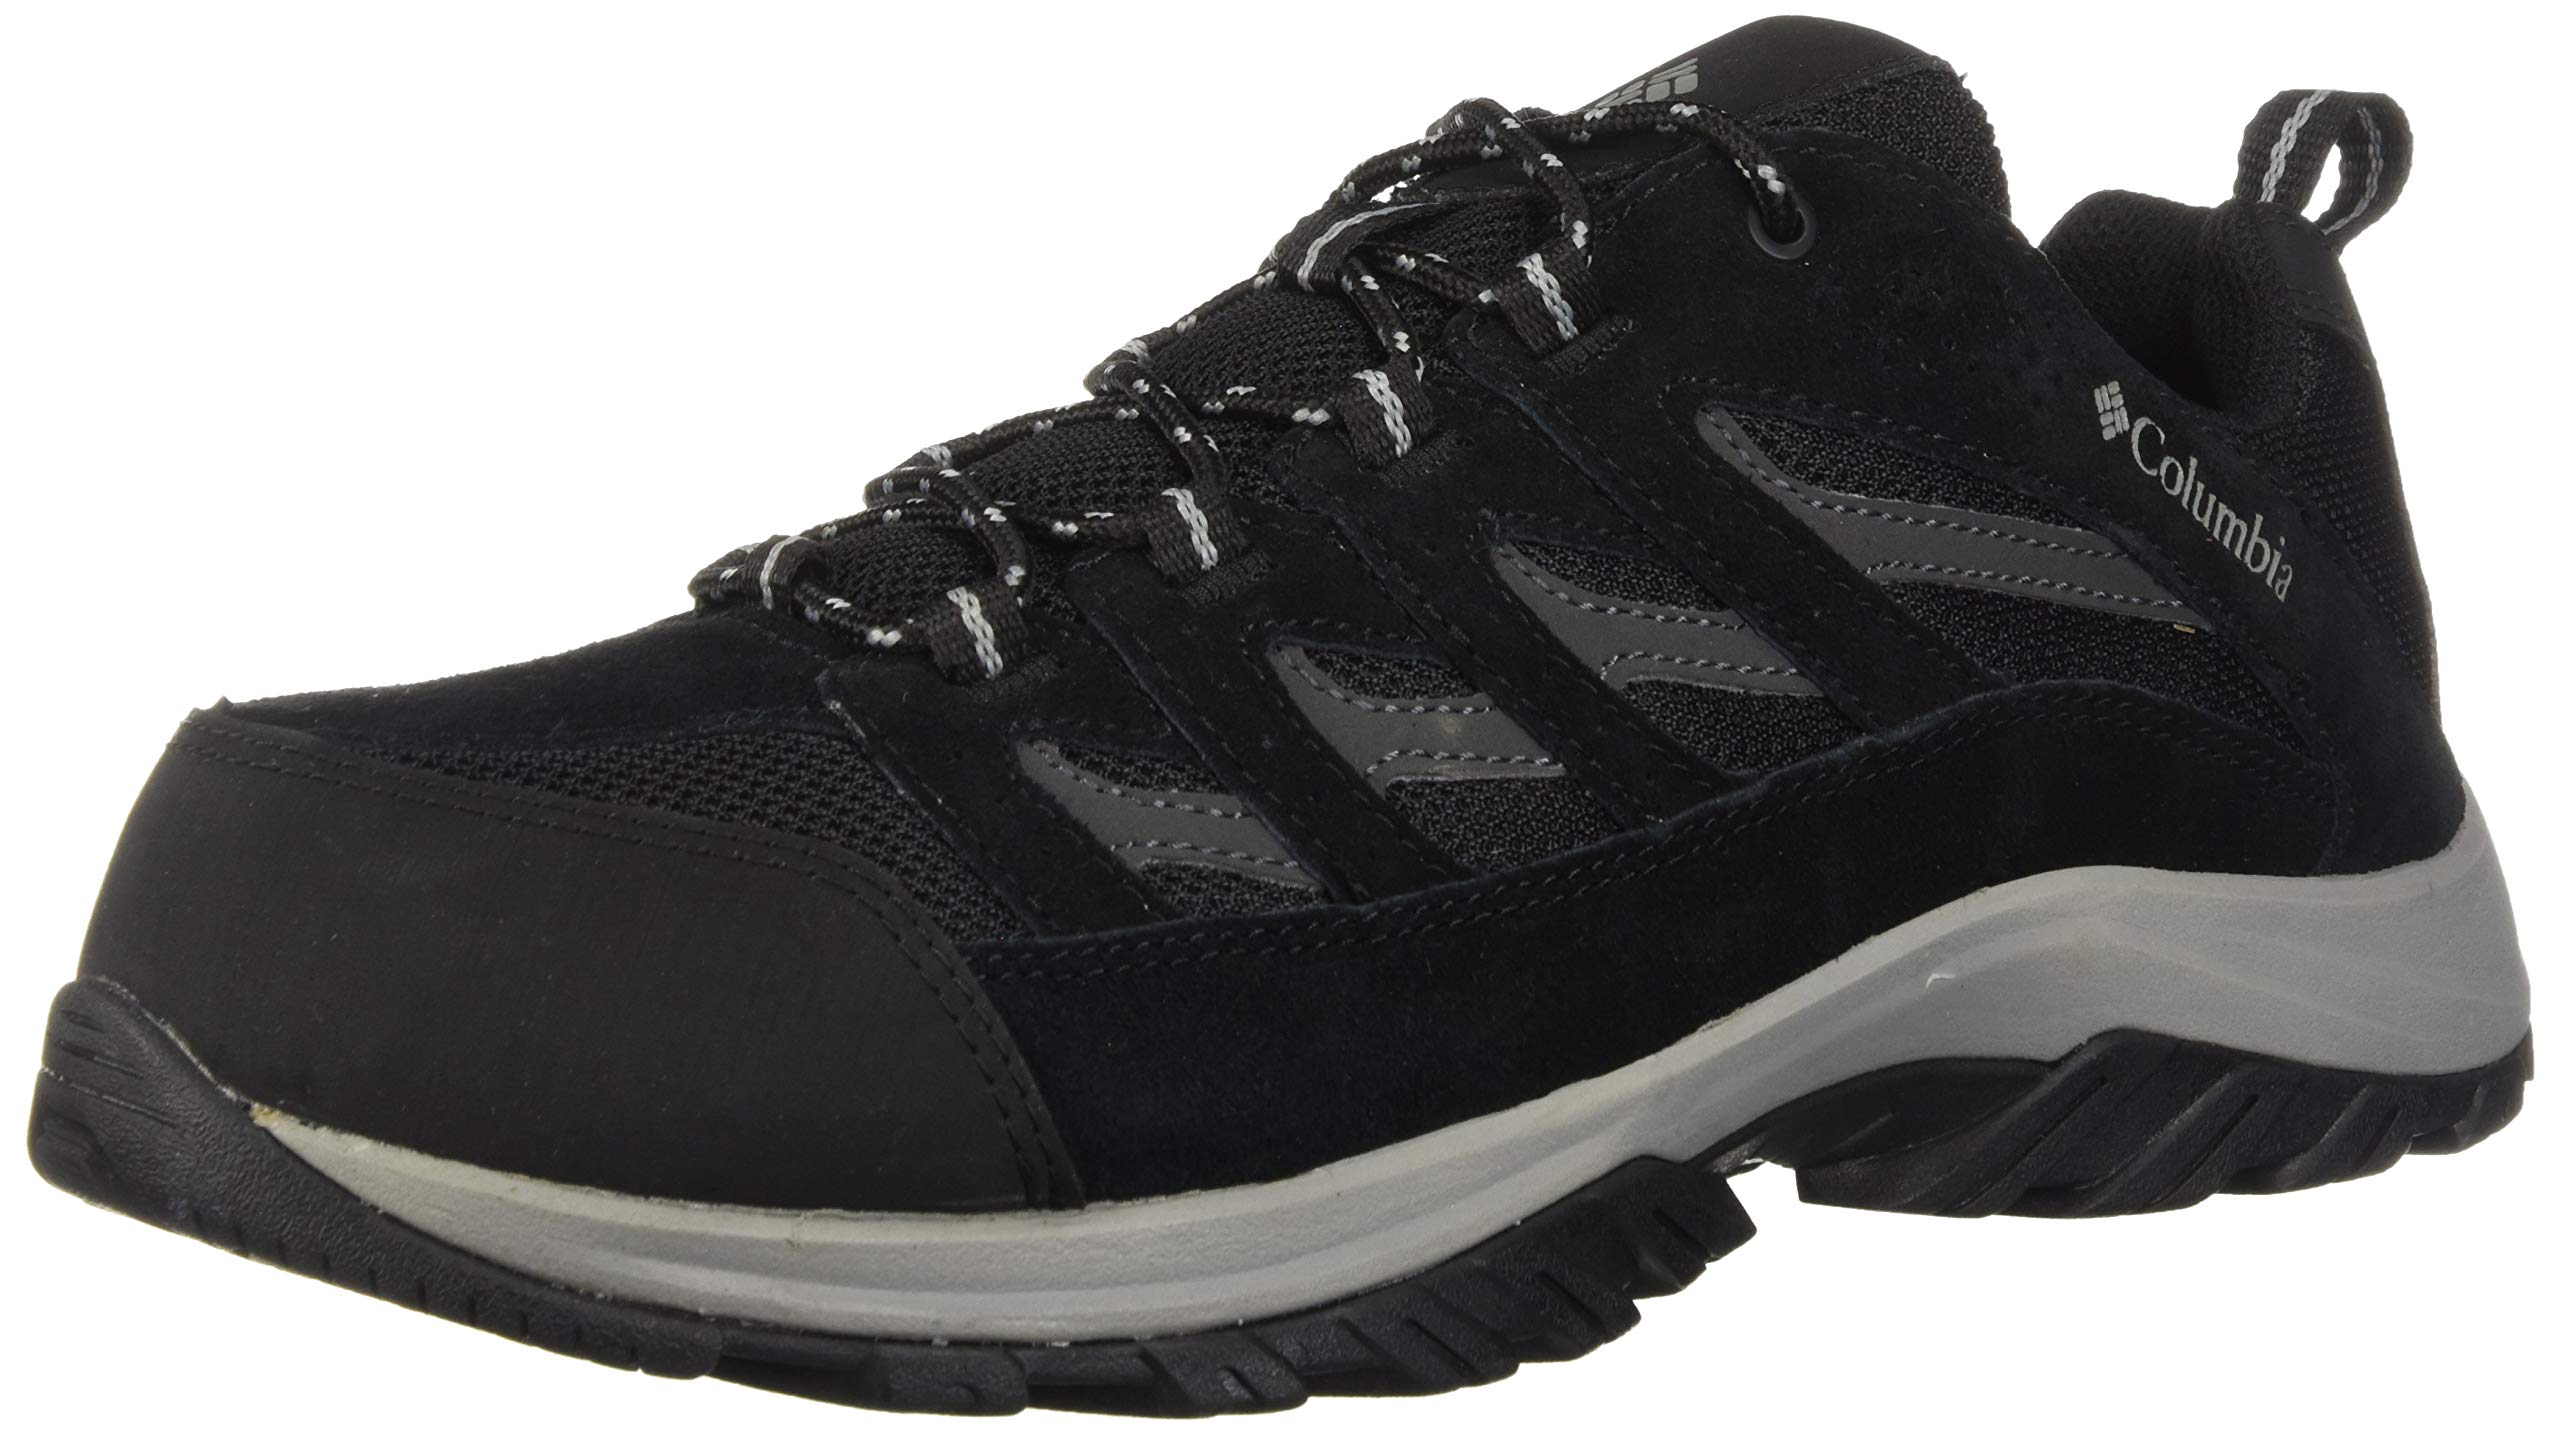 Columbia Men's Crestwood Hiking Shoe, Black/Columbia Grey, Grey, 16 Regular US